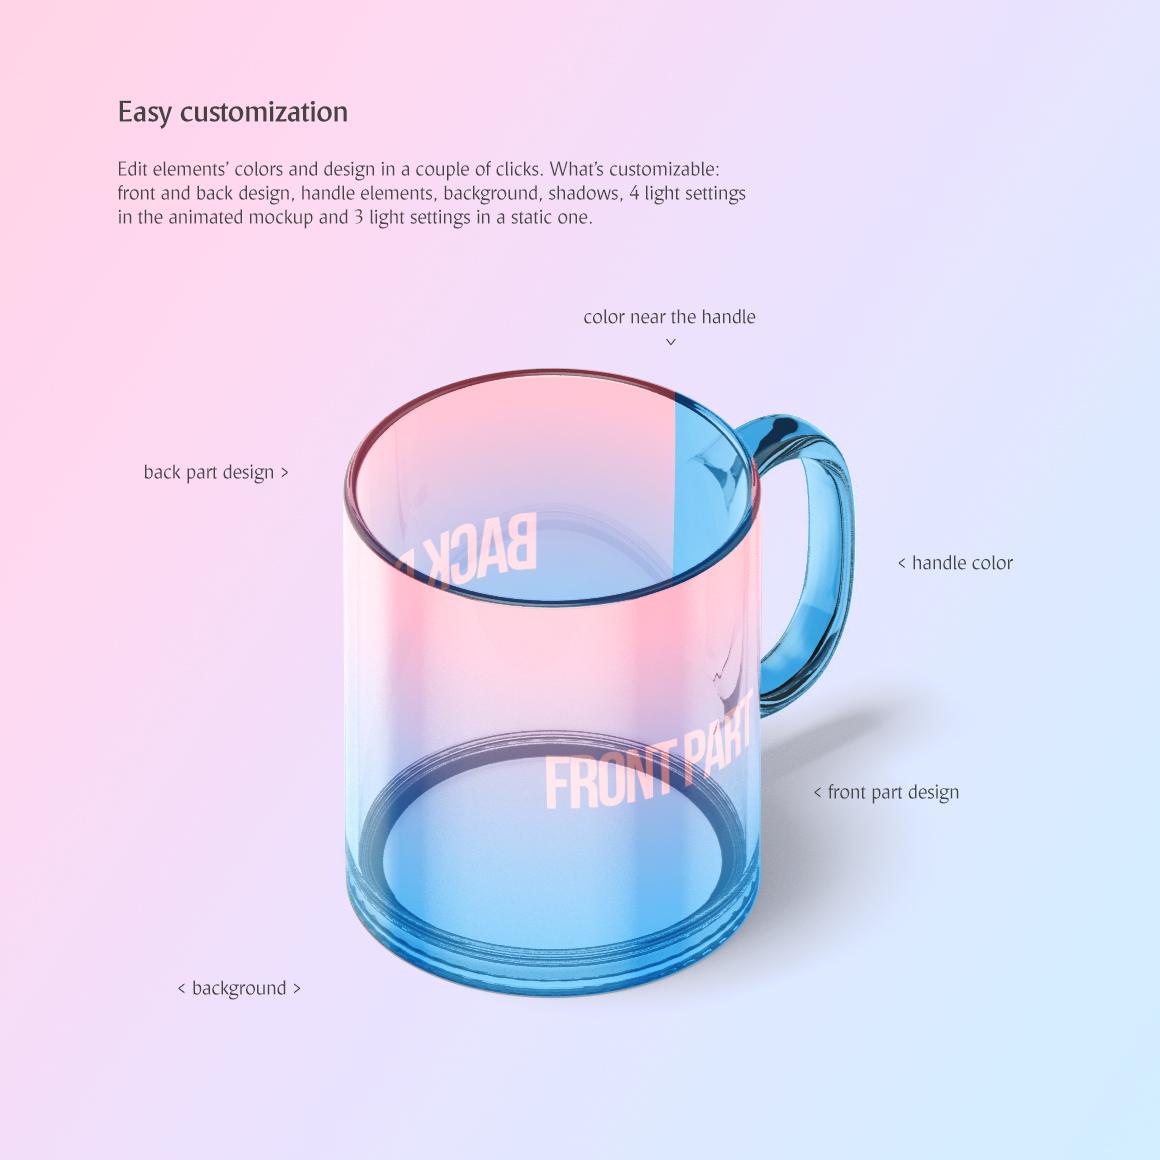 New Glass Mug Animated Mockup example image 4